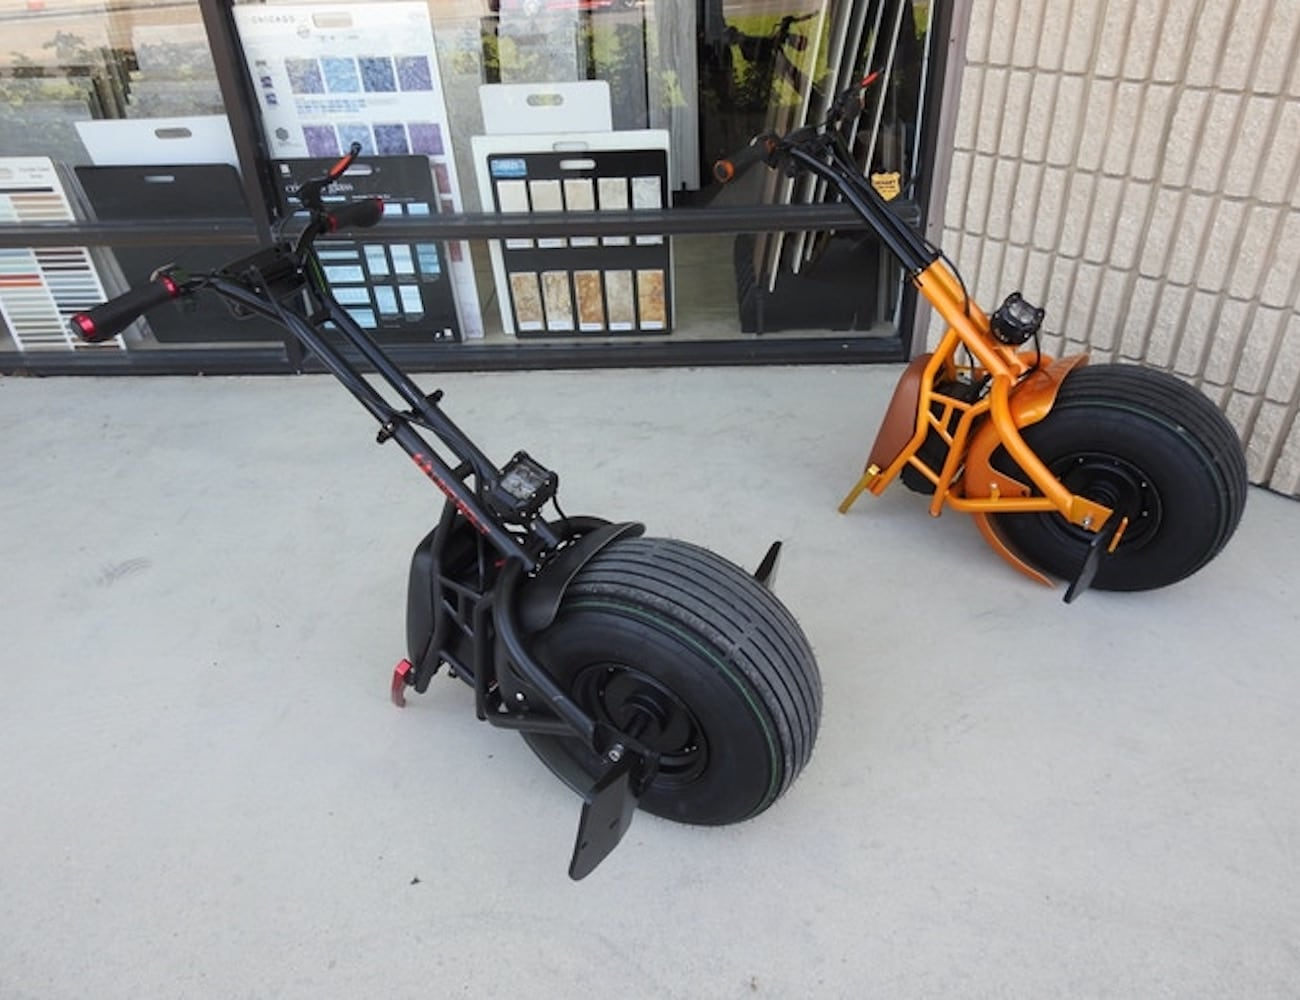 SUPERRIDE S1000 Self Balancing Electric Unicycle